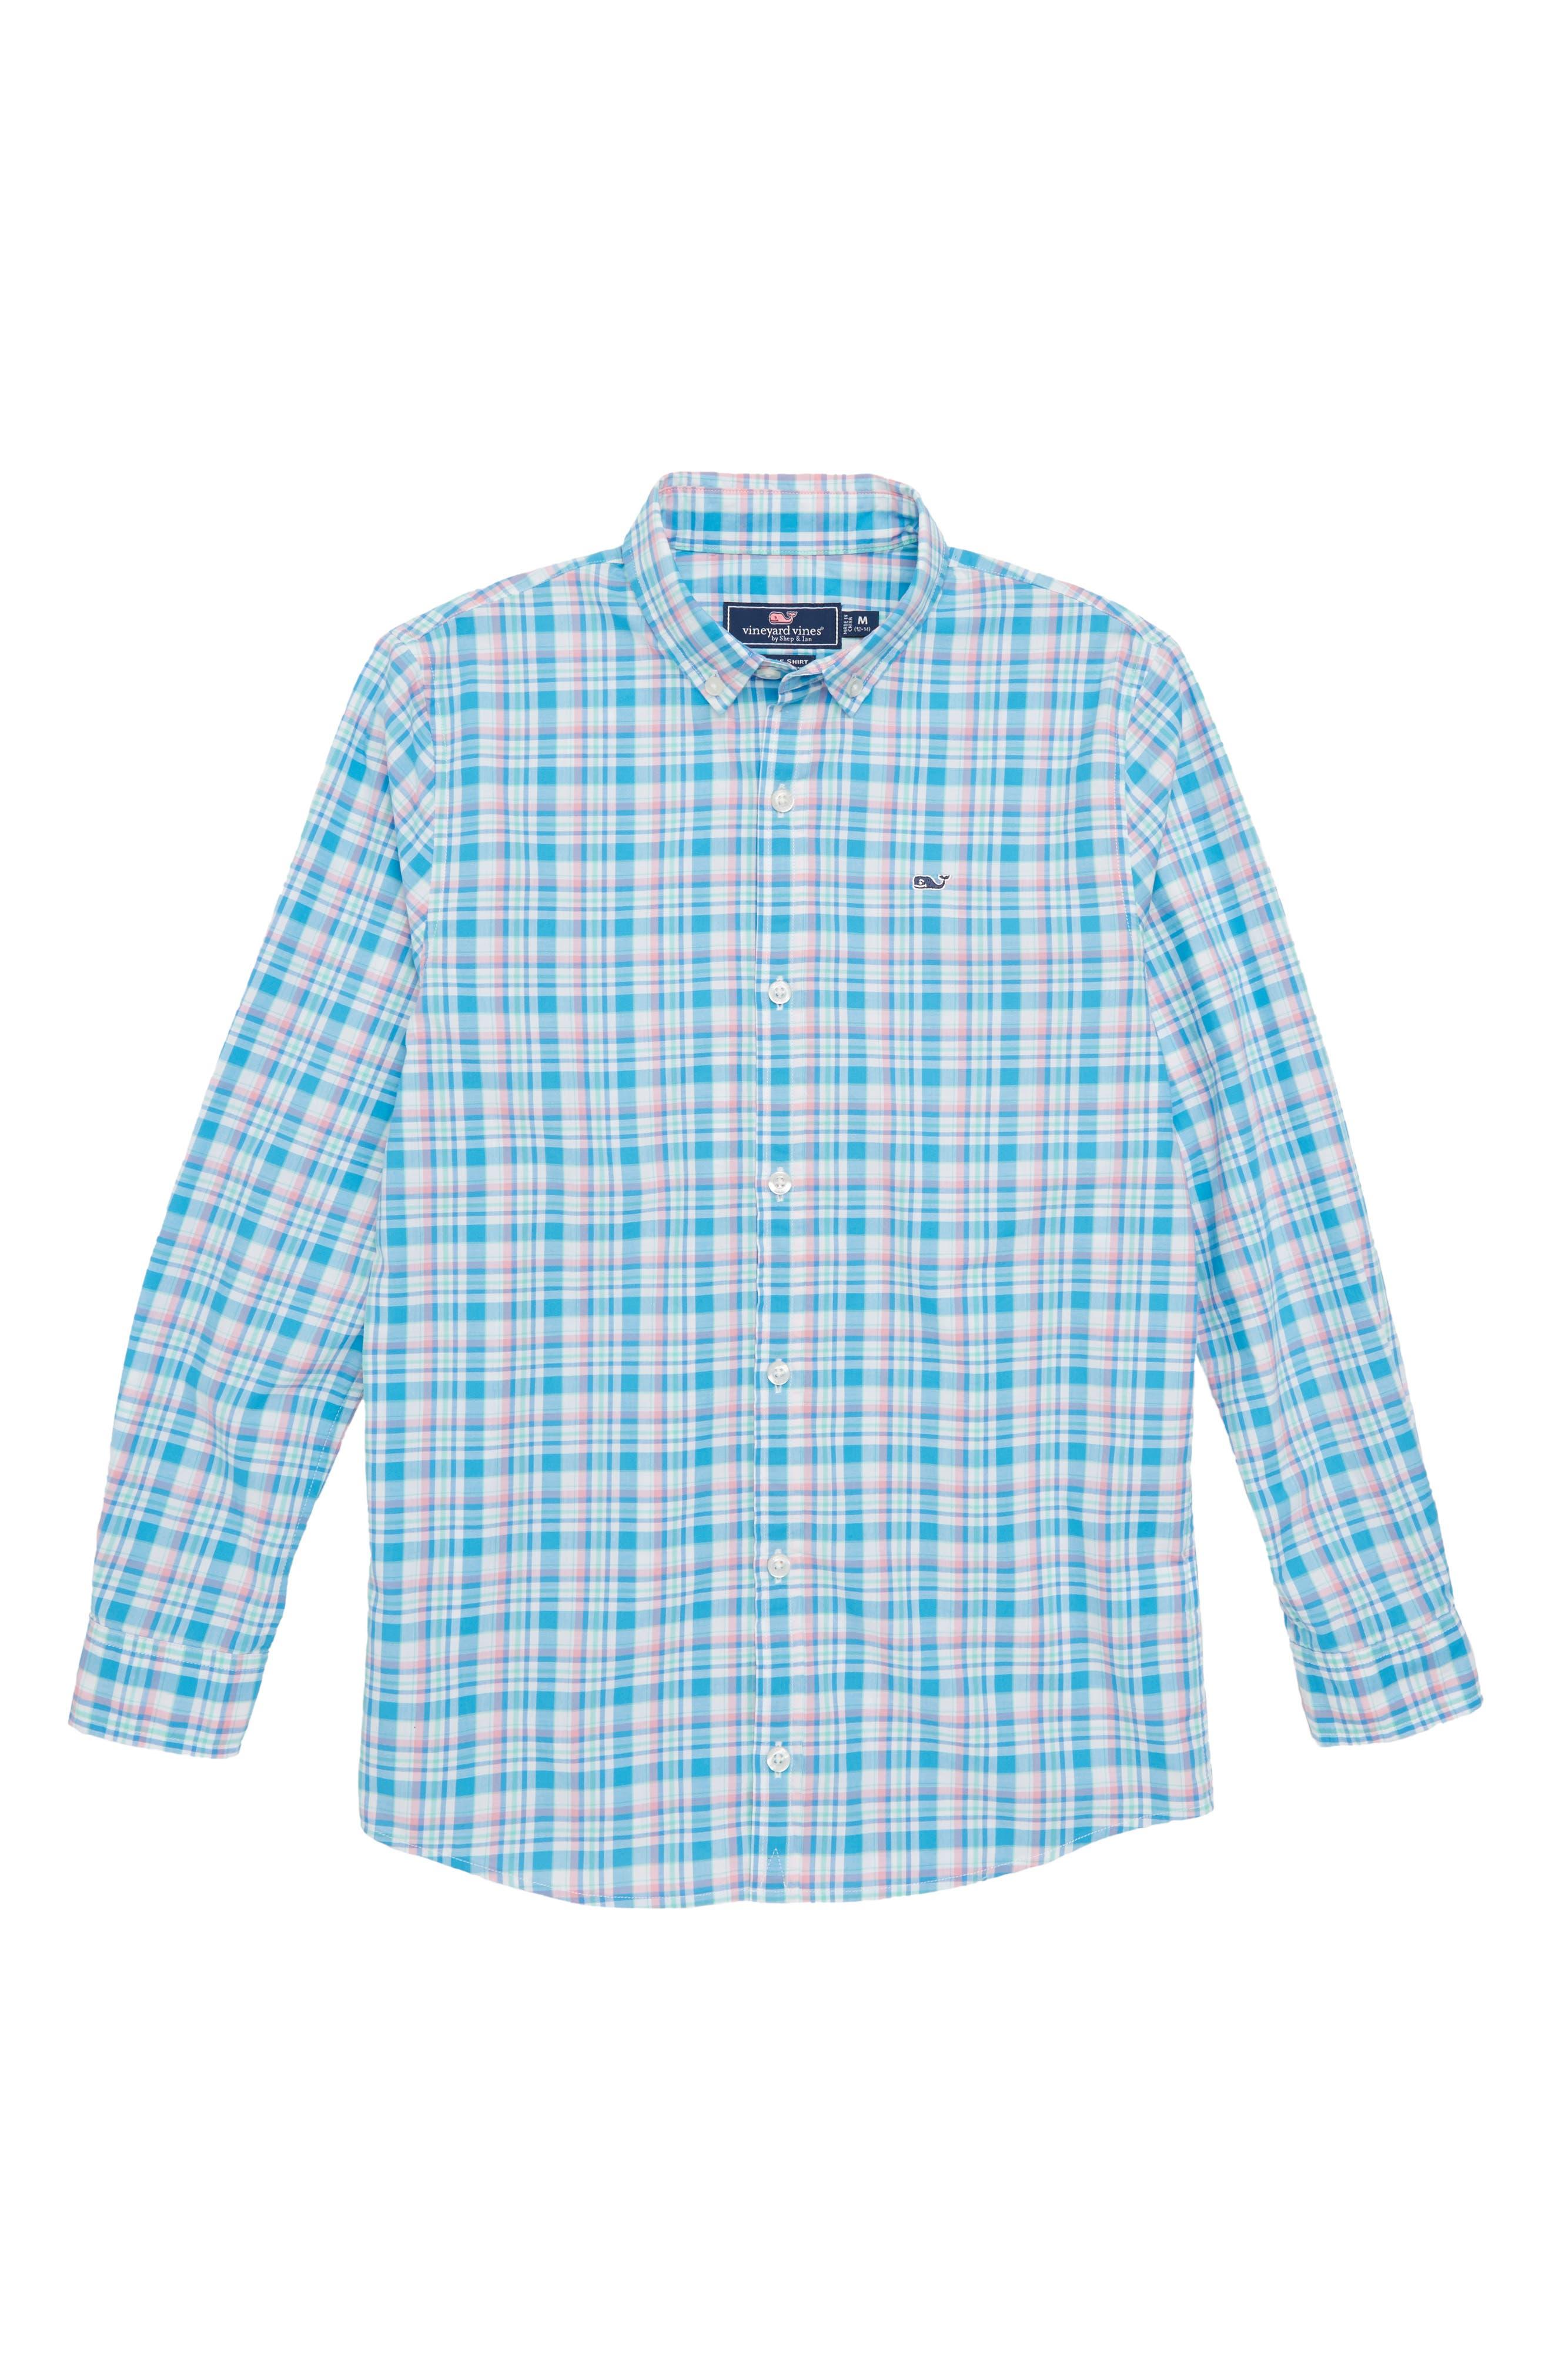 vinyeard vines Pinmy's Point Plaid Whale Shirt (Toddler Boys & Little Boys)